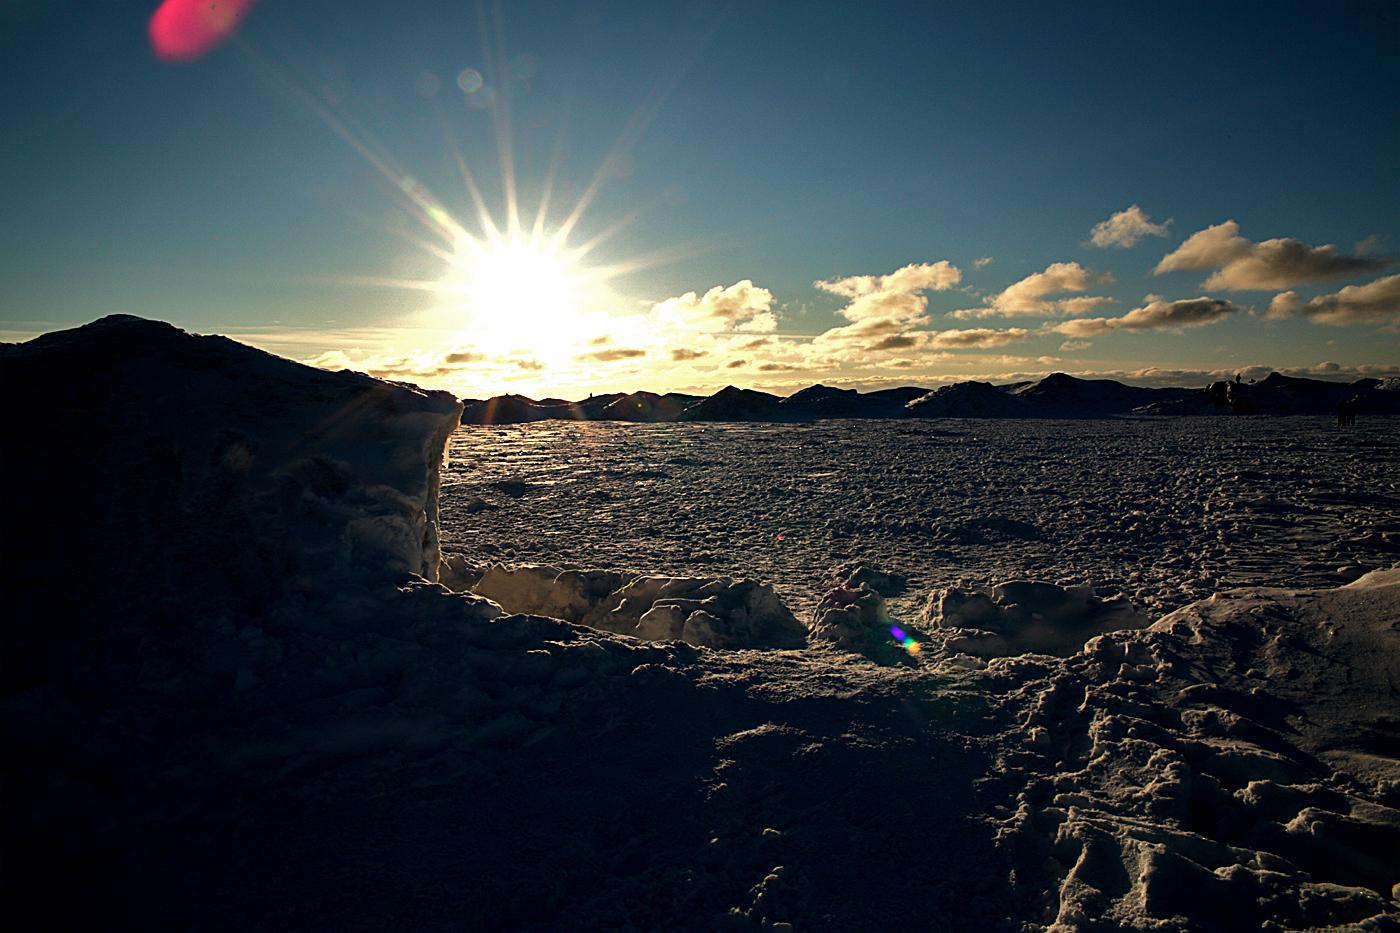 betsie bay ice caves at sunset#1.jpg